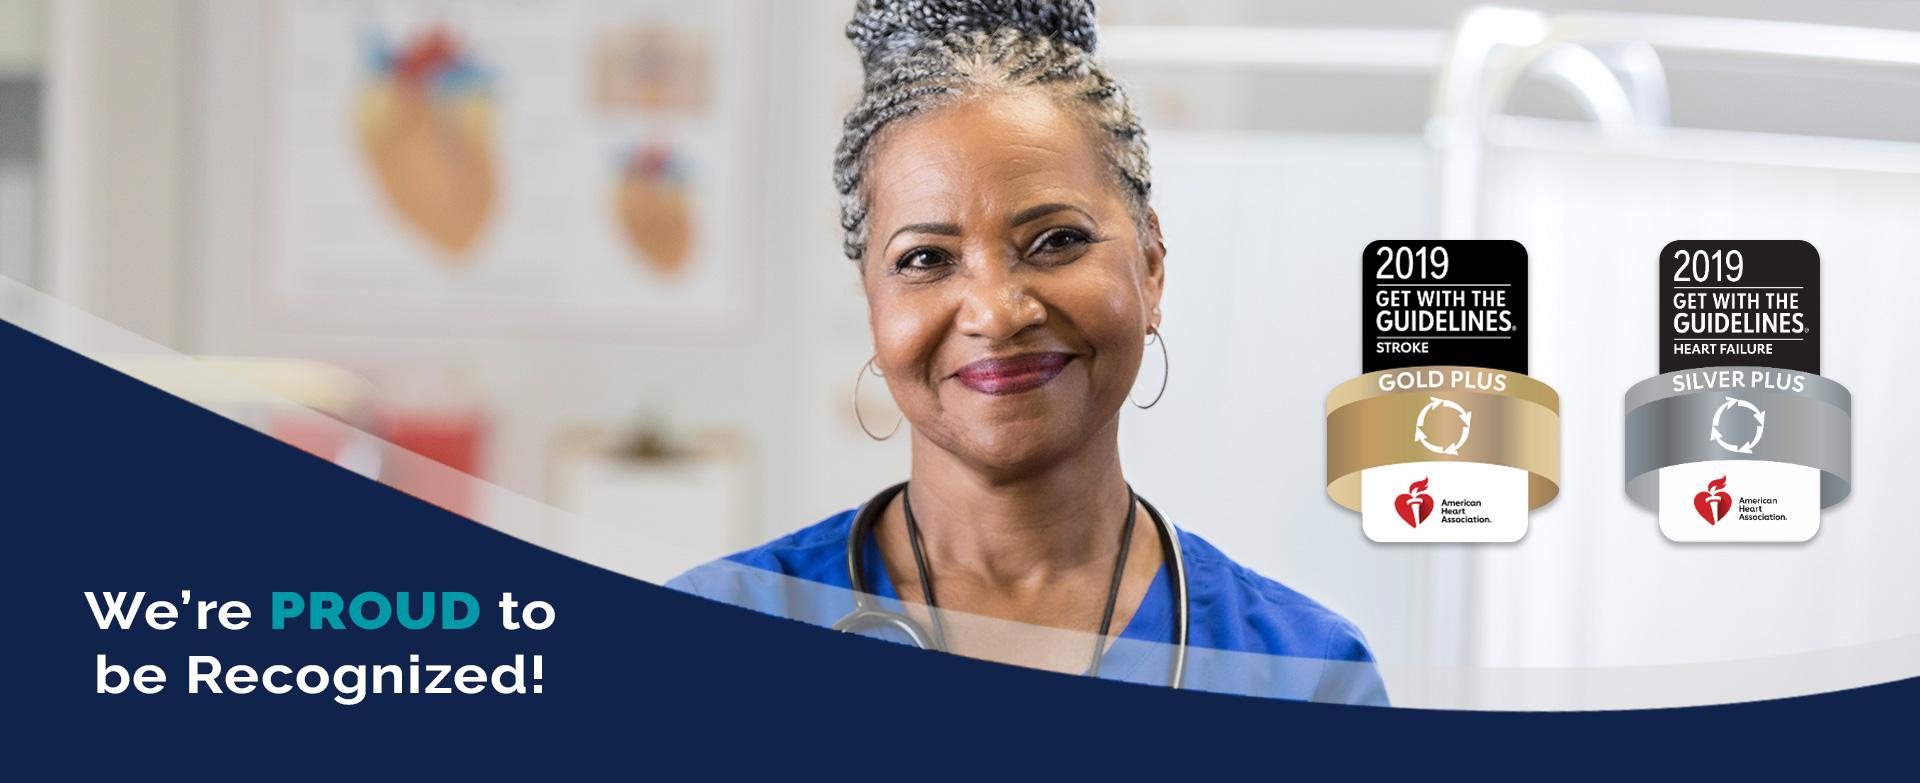 St  John's Episcopal Hospital :: Health Services